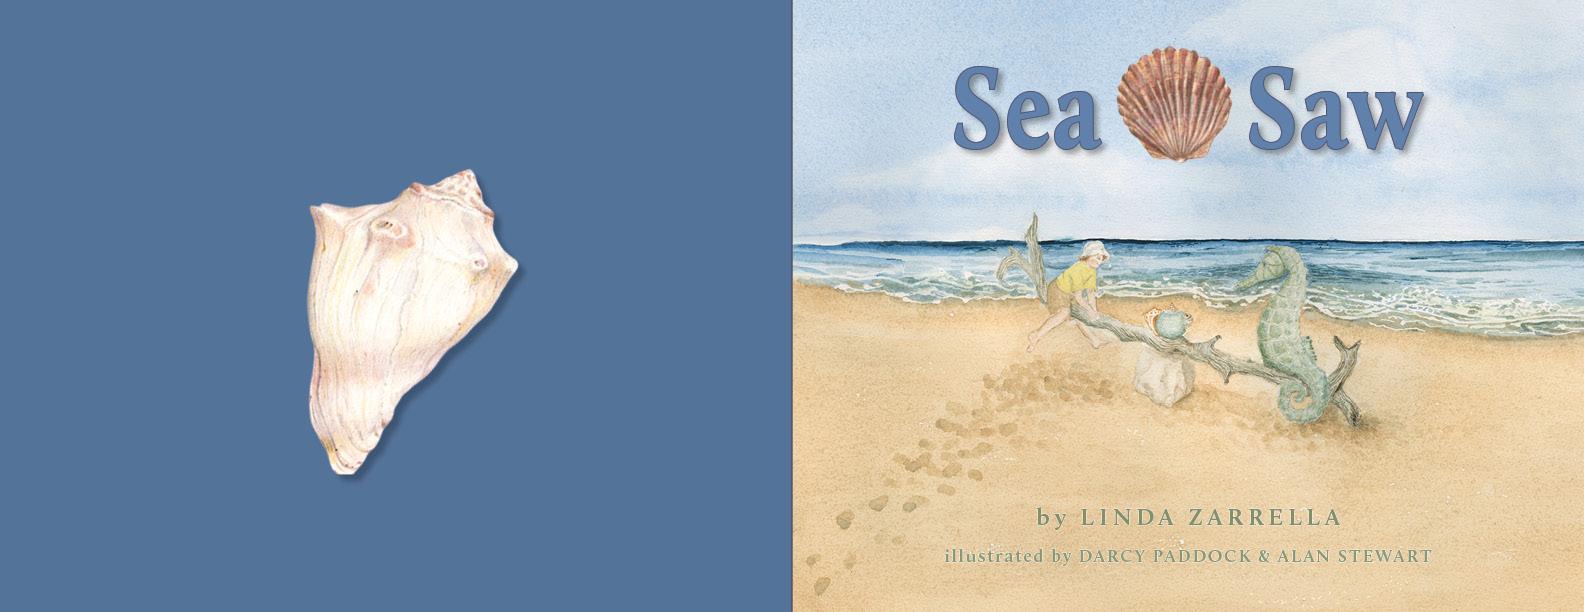 Sea Saw Cover v4.jpg